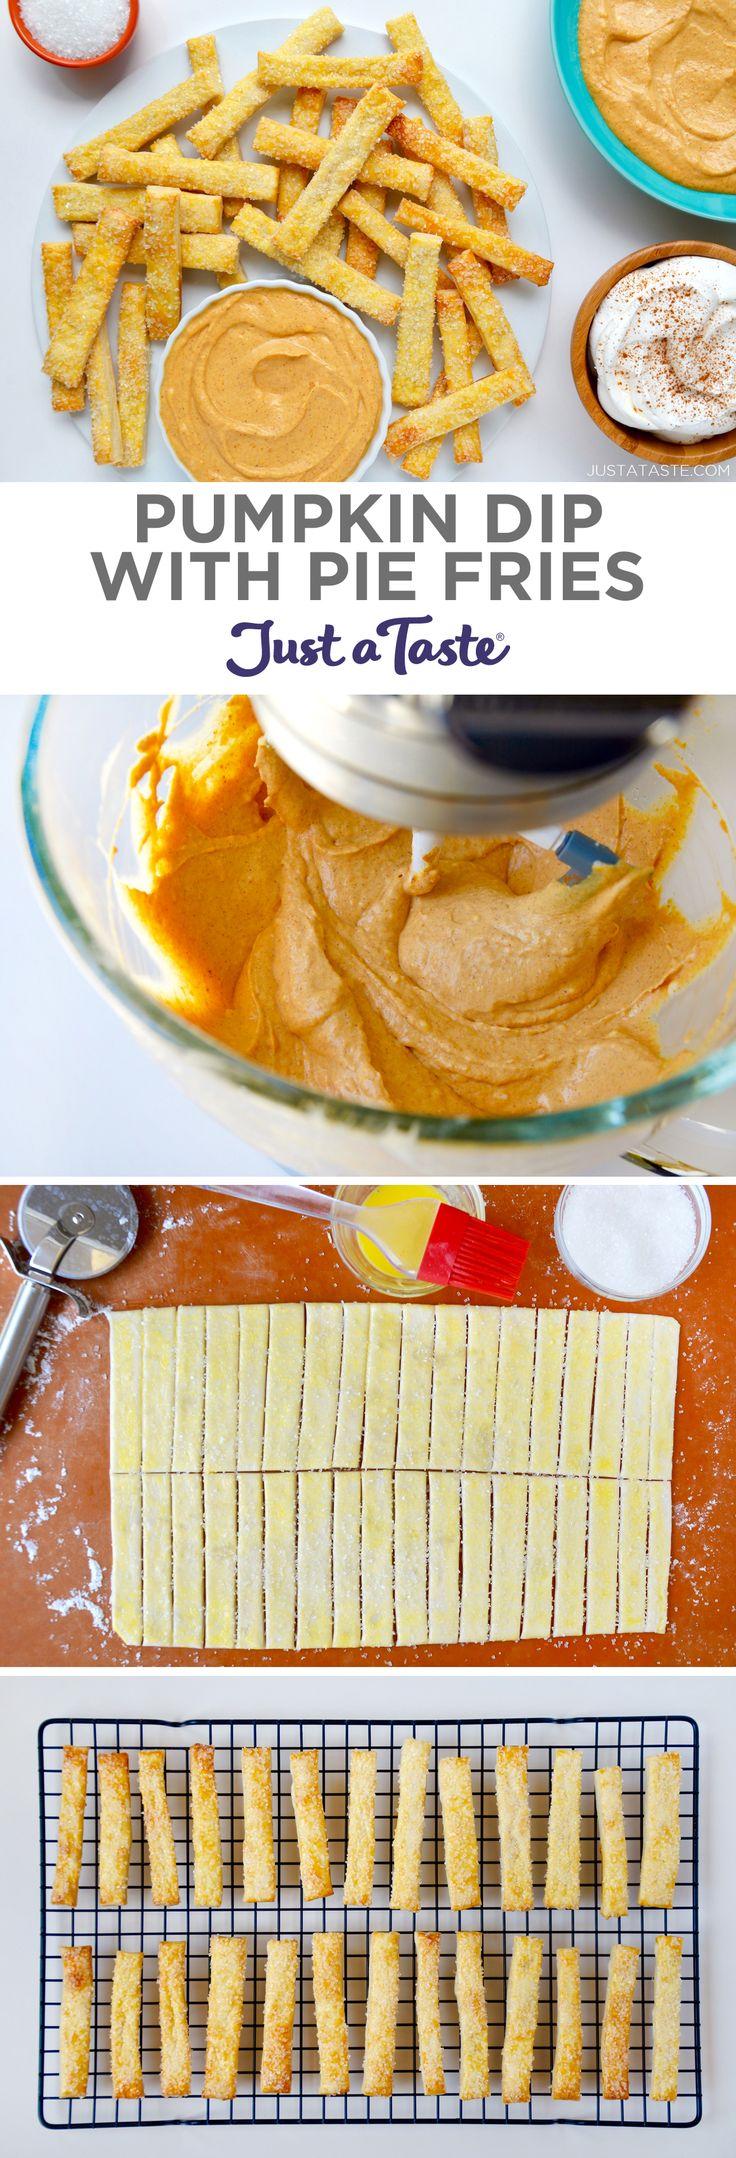 "Pumpkin Dip with Pie ""Fries"" justataste.com #pumpkin #recipe #thanksgiving"